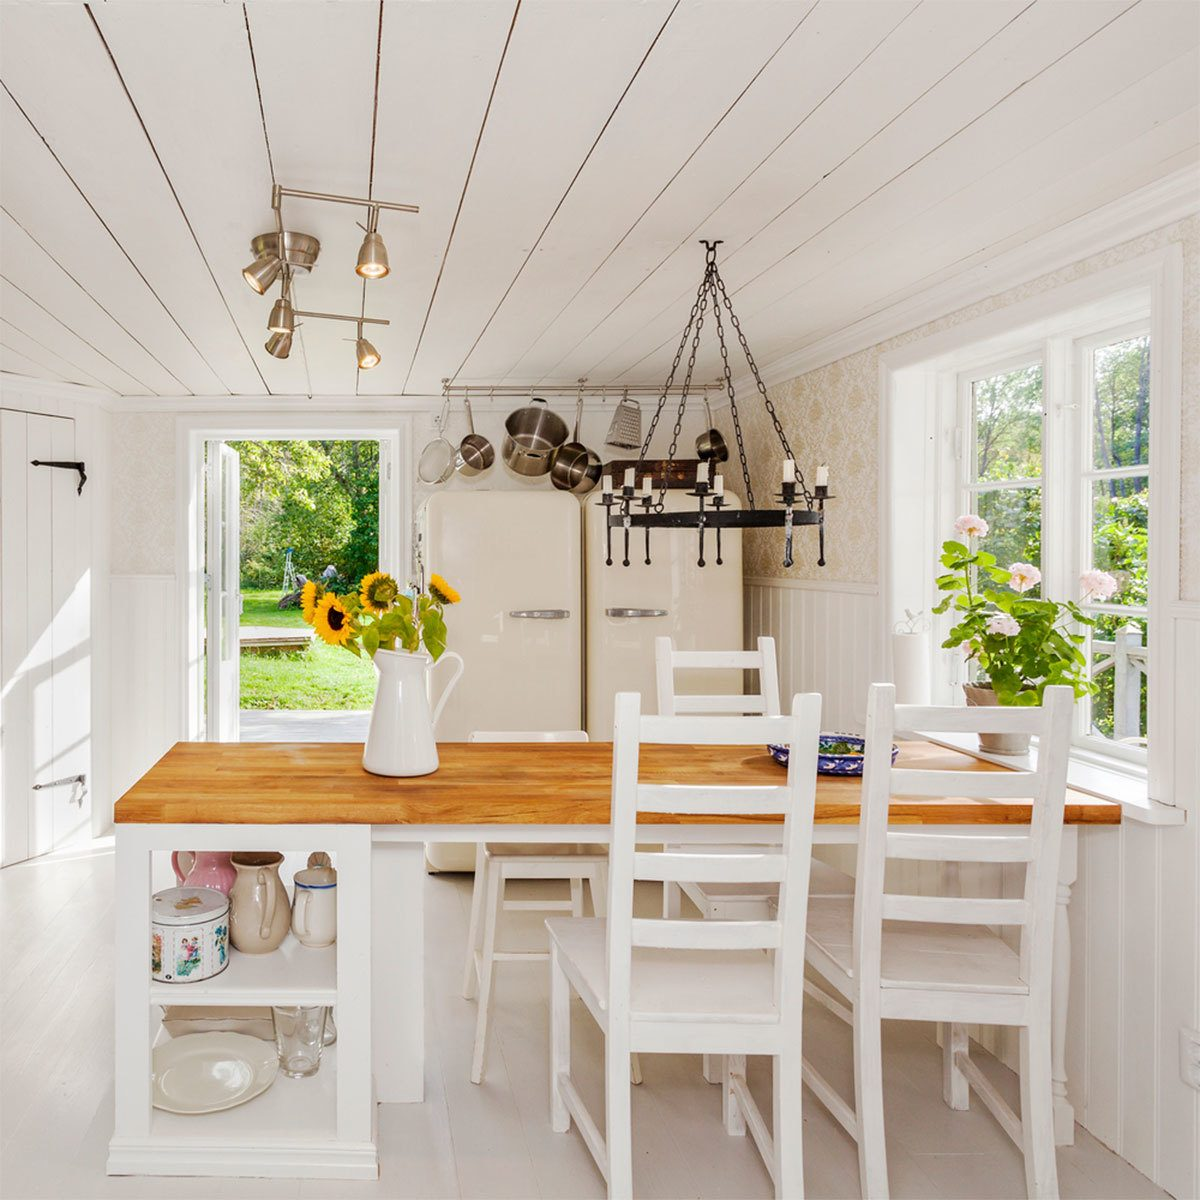 Farmhouse Look: Shiplap